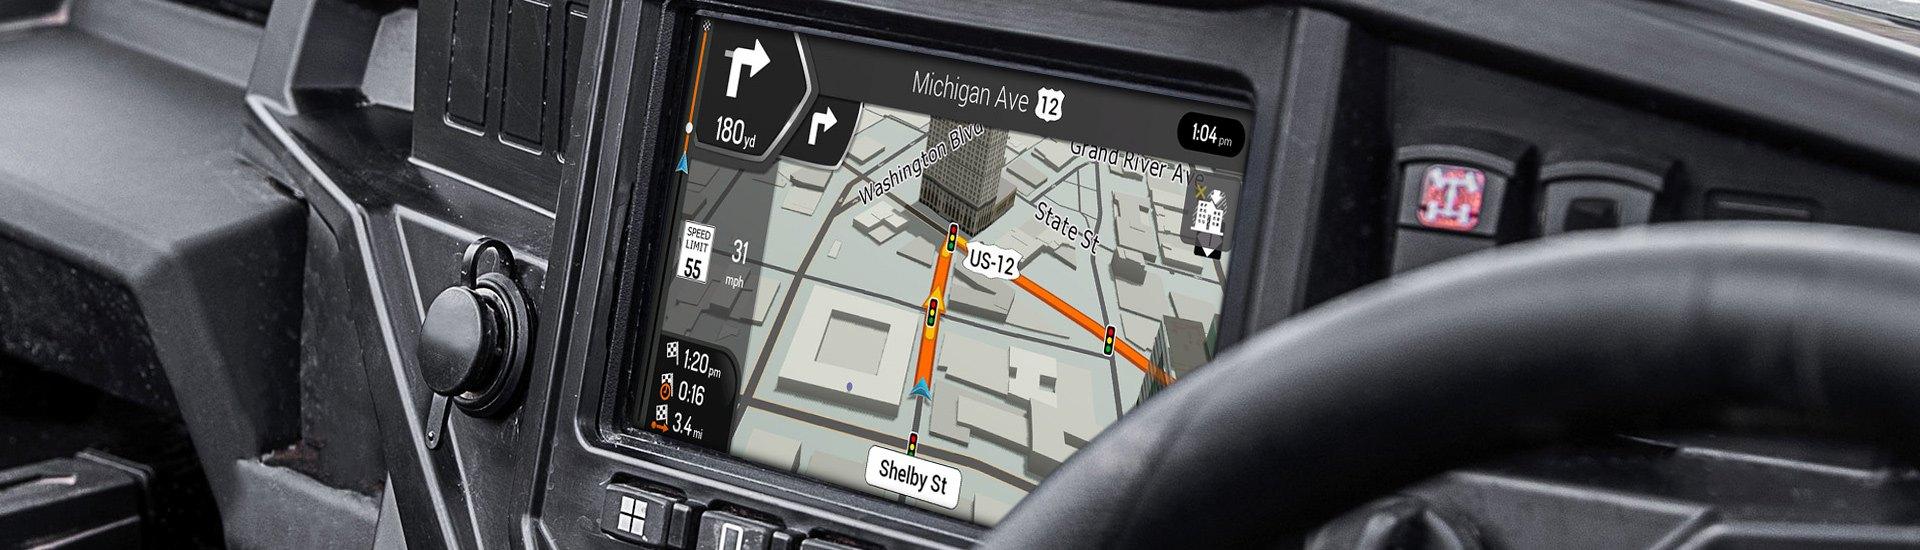 UTV GPS & Navigation - POWERSPORTSiD com